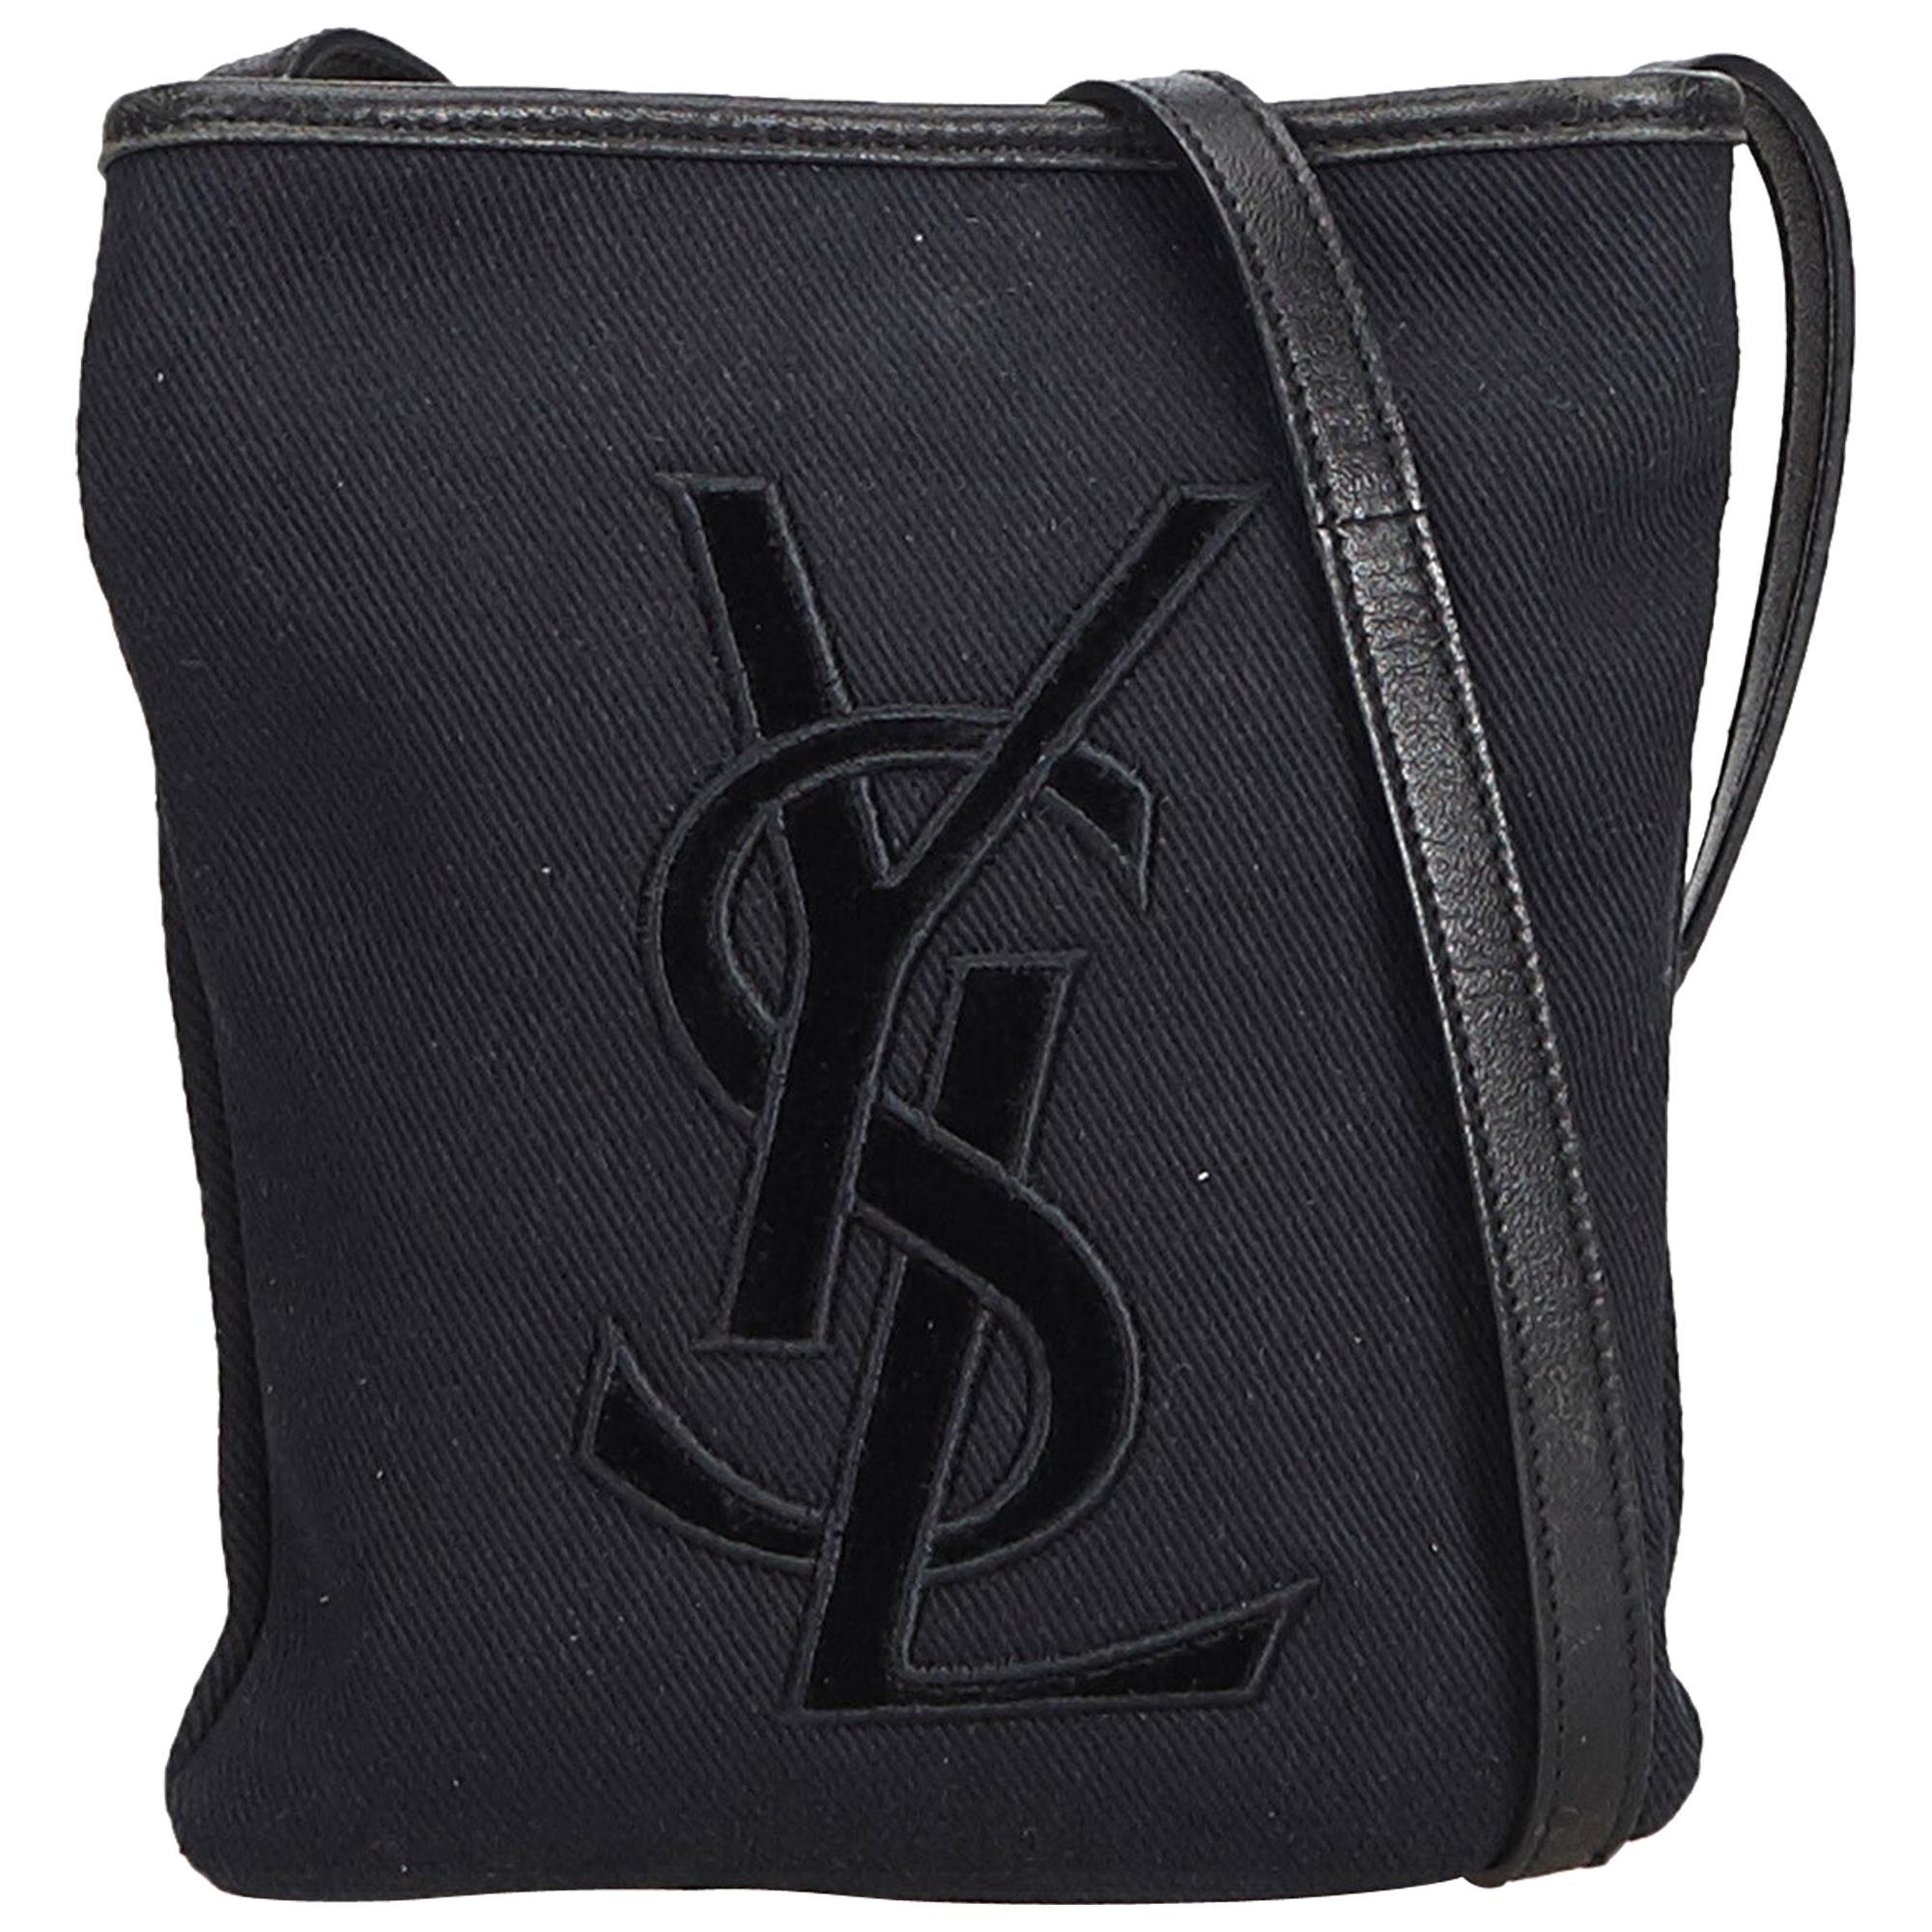 da71fc1ab8 Mulberry Black Leather Antony Messenger Bag at 1stdibs